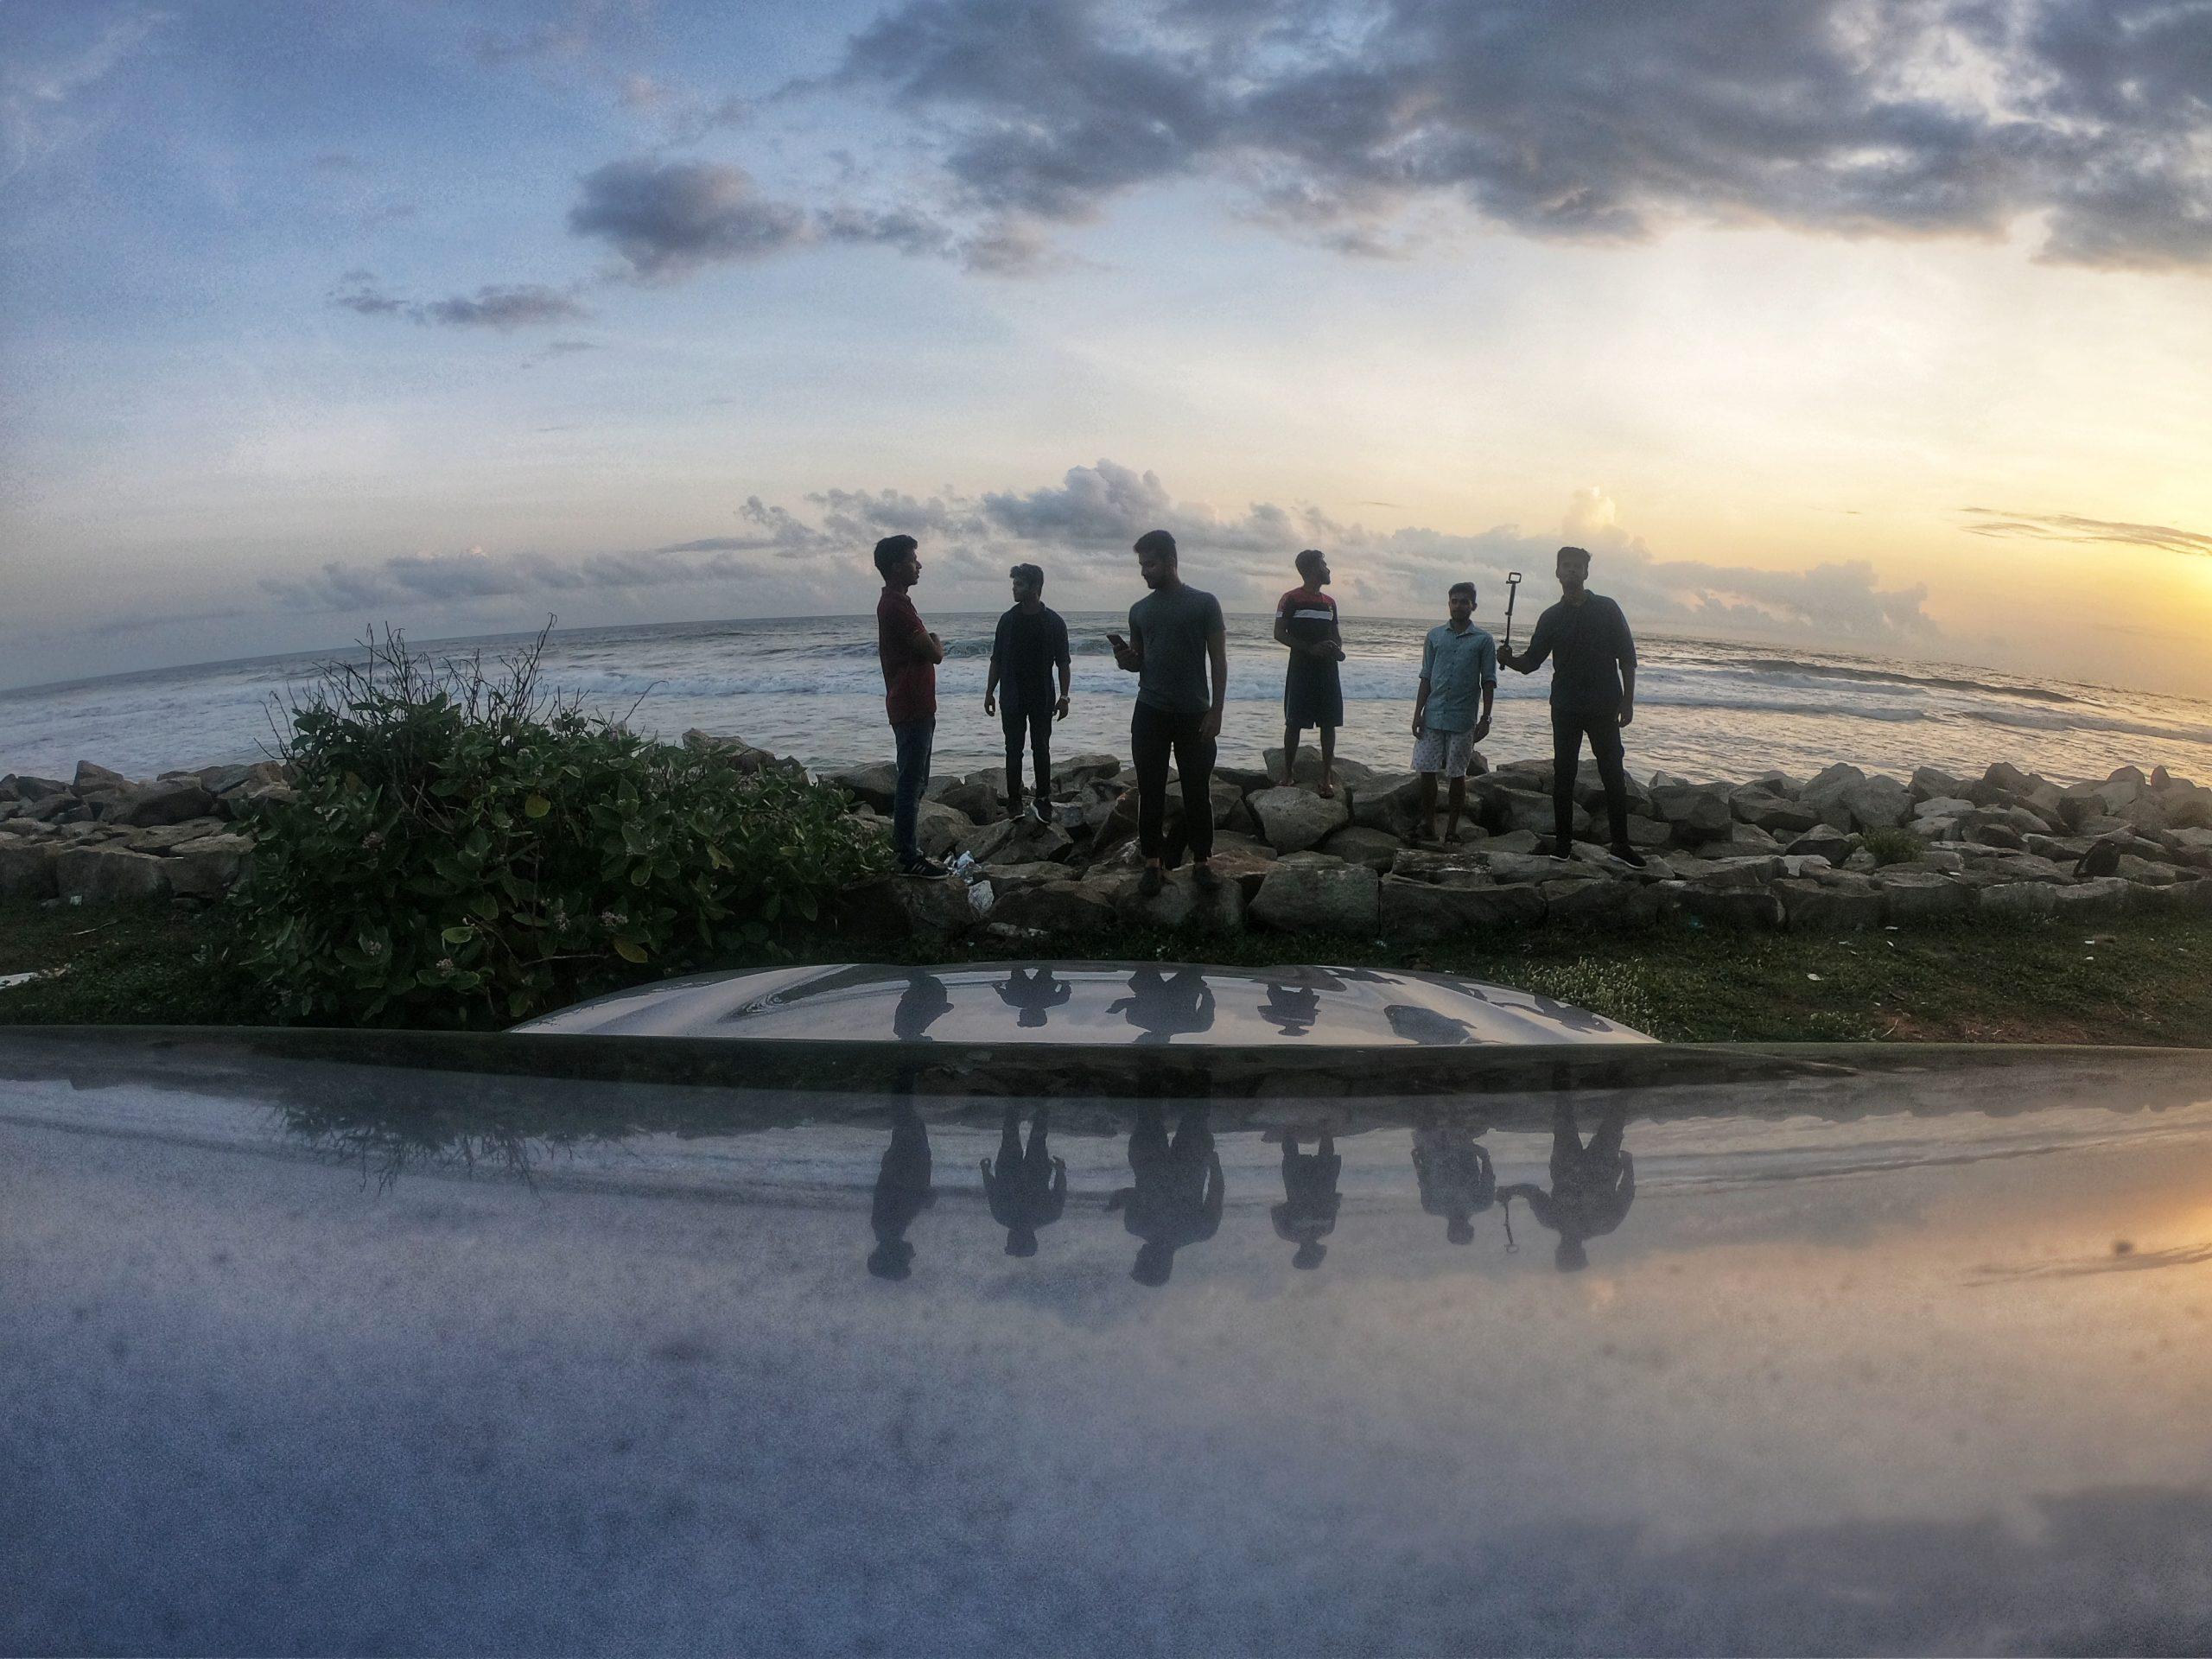 Group of men standing on rocks beside the sea